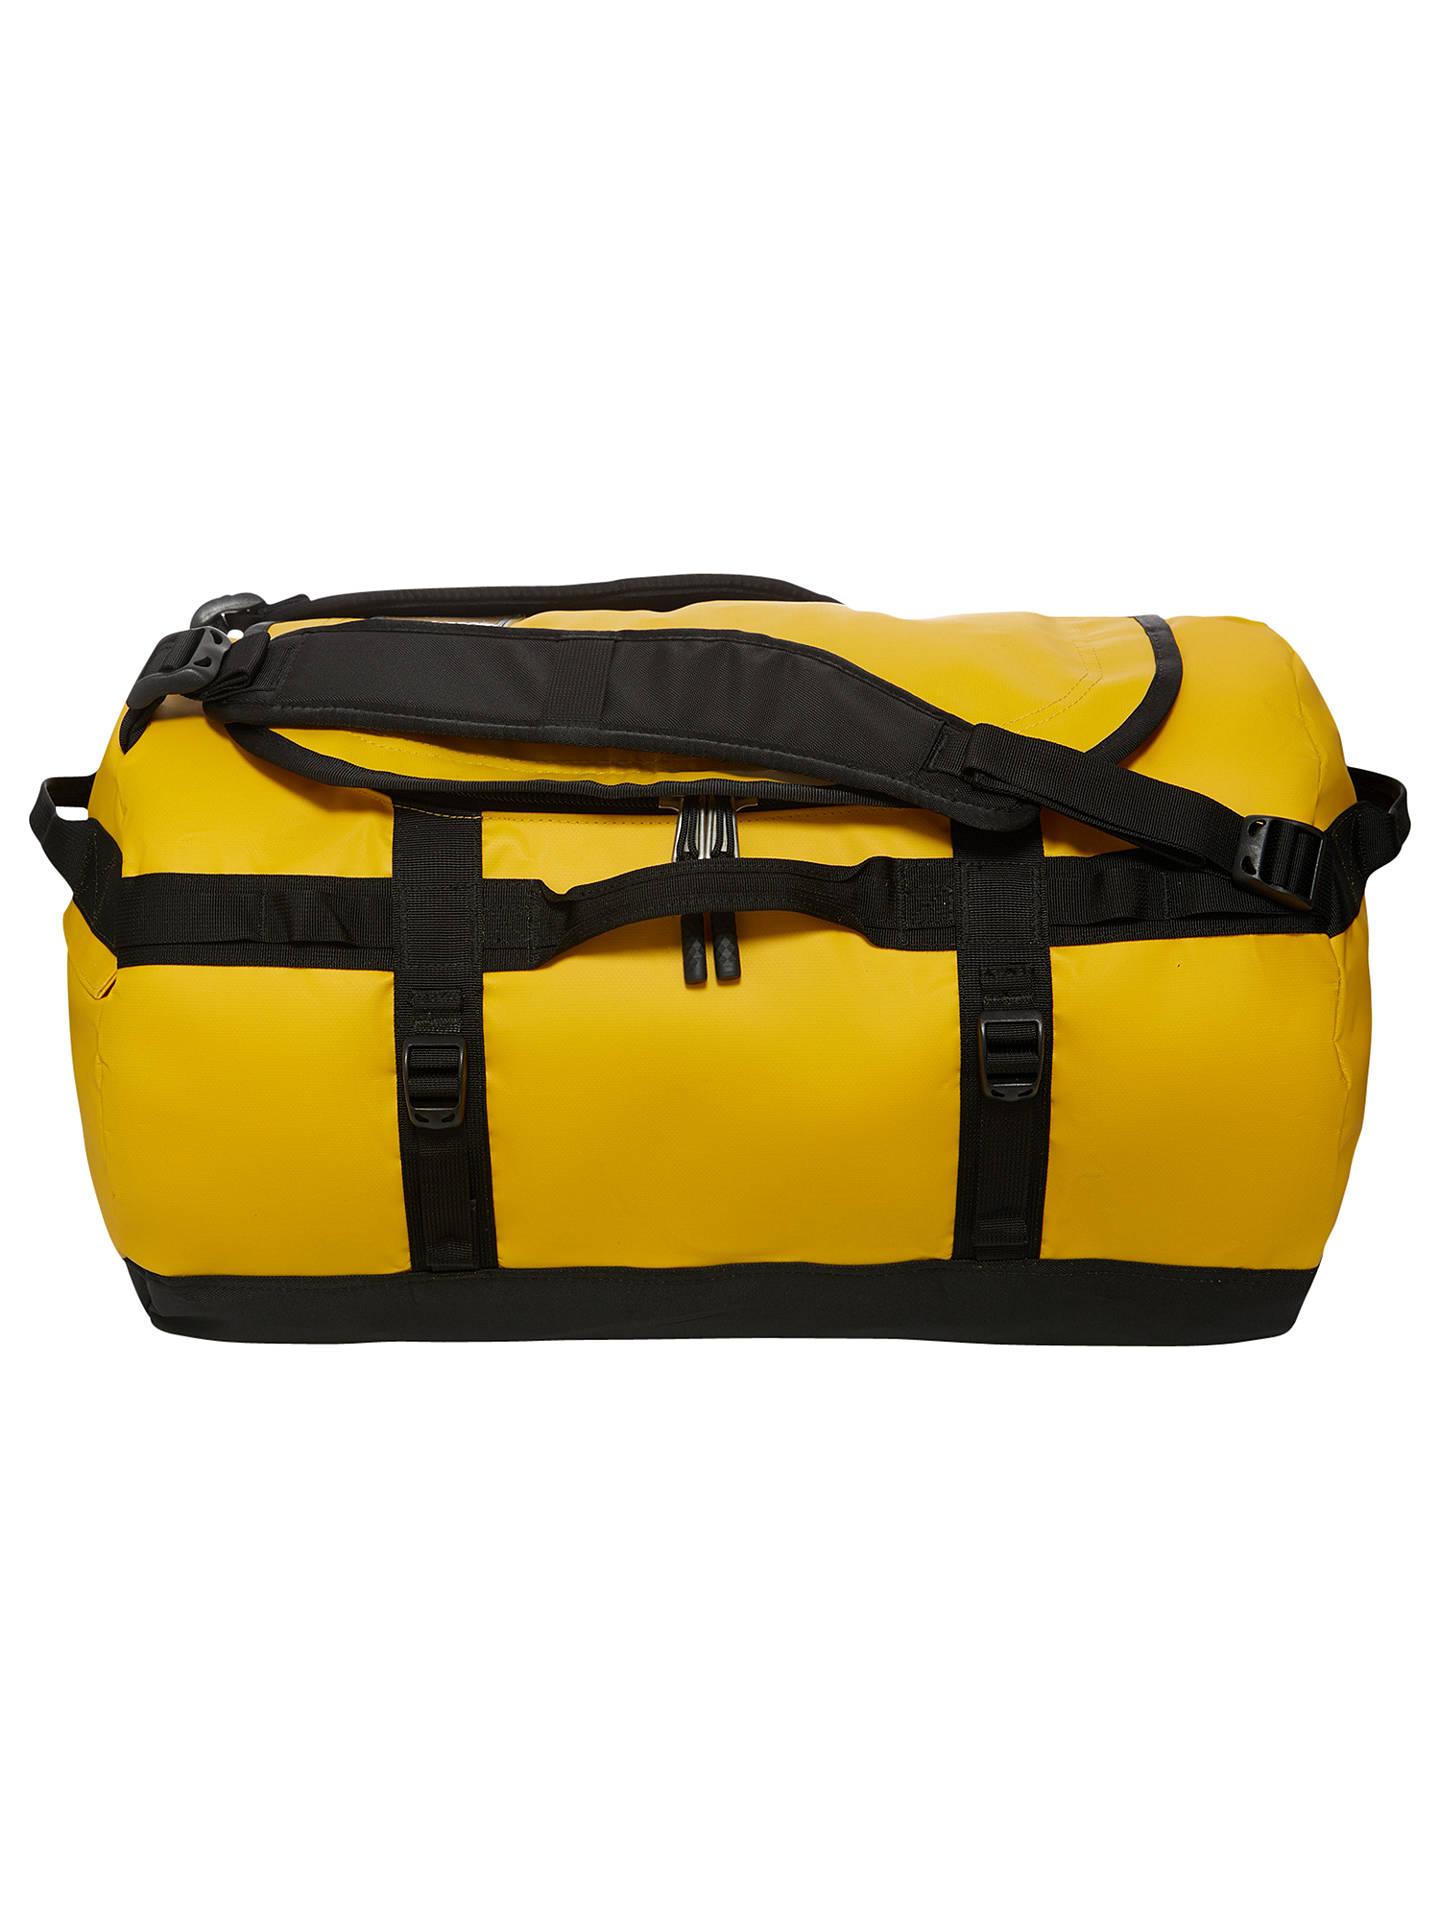 f5cd687606 Buy The North Face Base Camp Duffle Bag